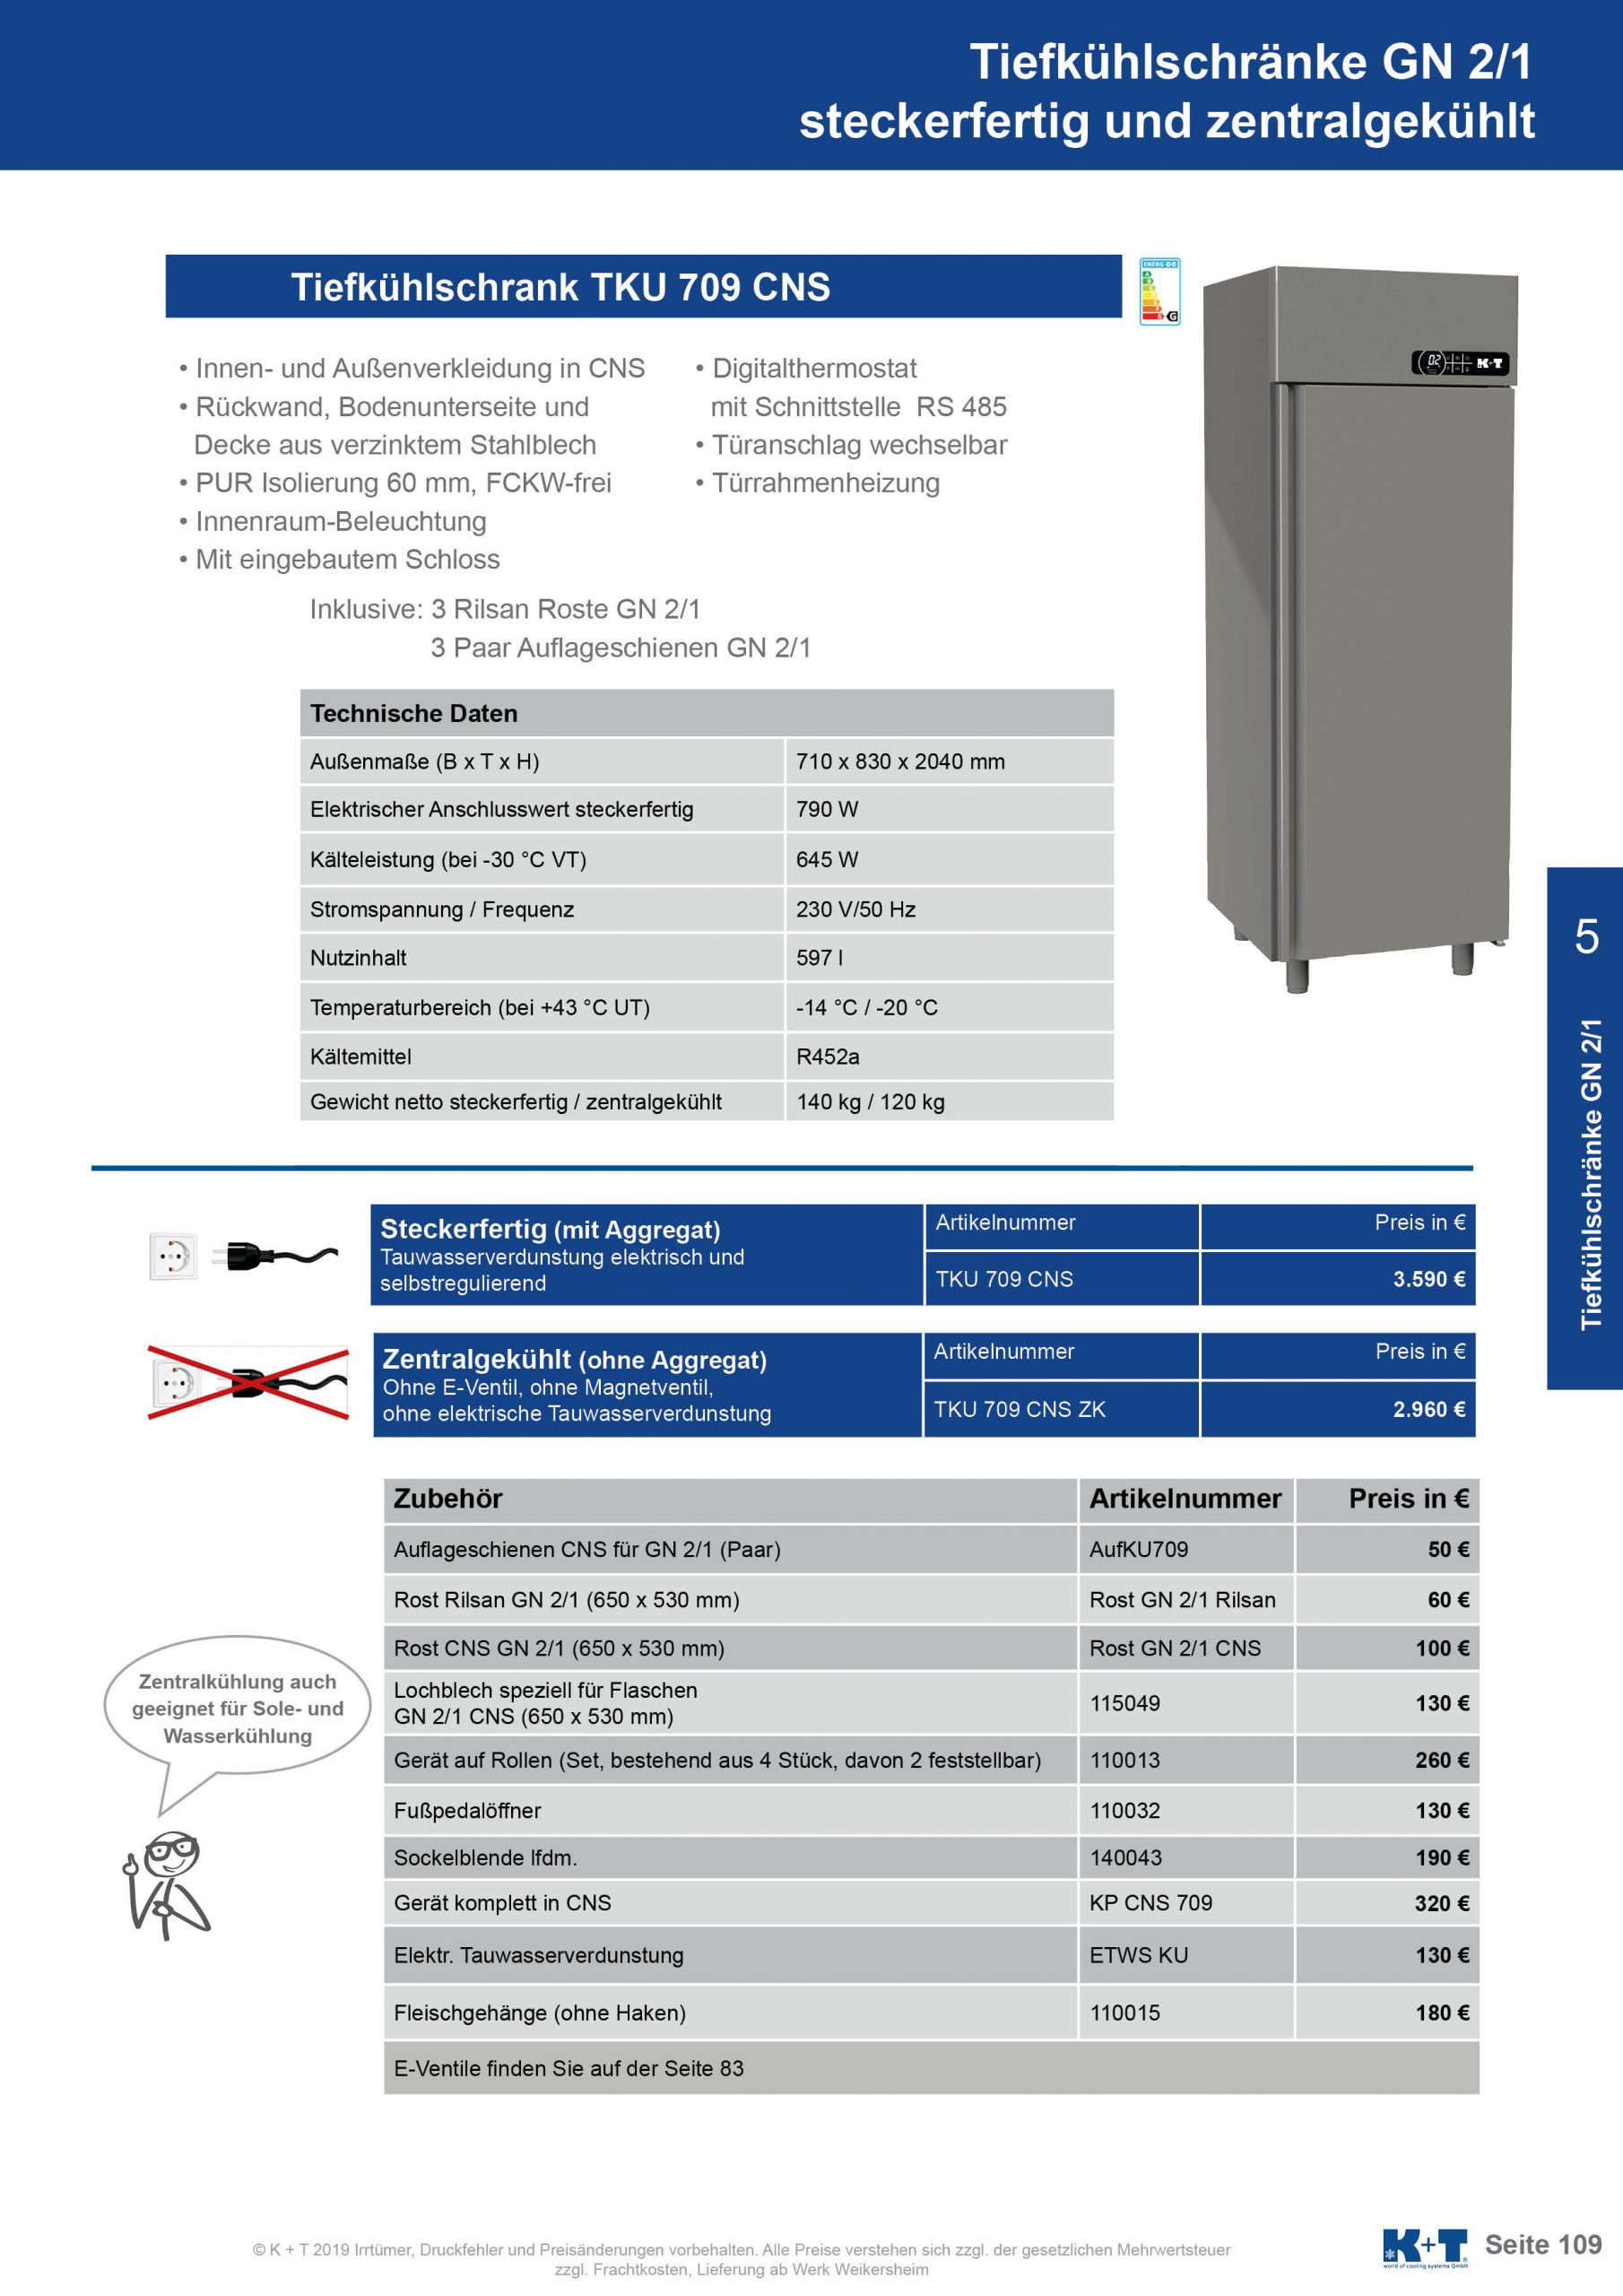 Tiefkühlschränke GN 2_1 Tiefkühlschrank zentralgekühlt